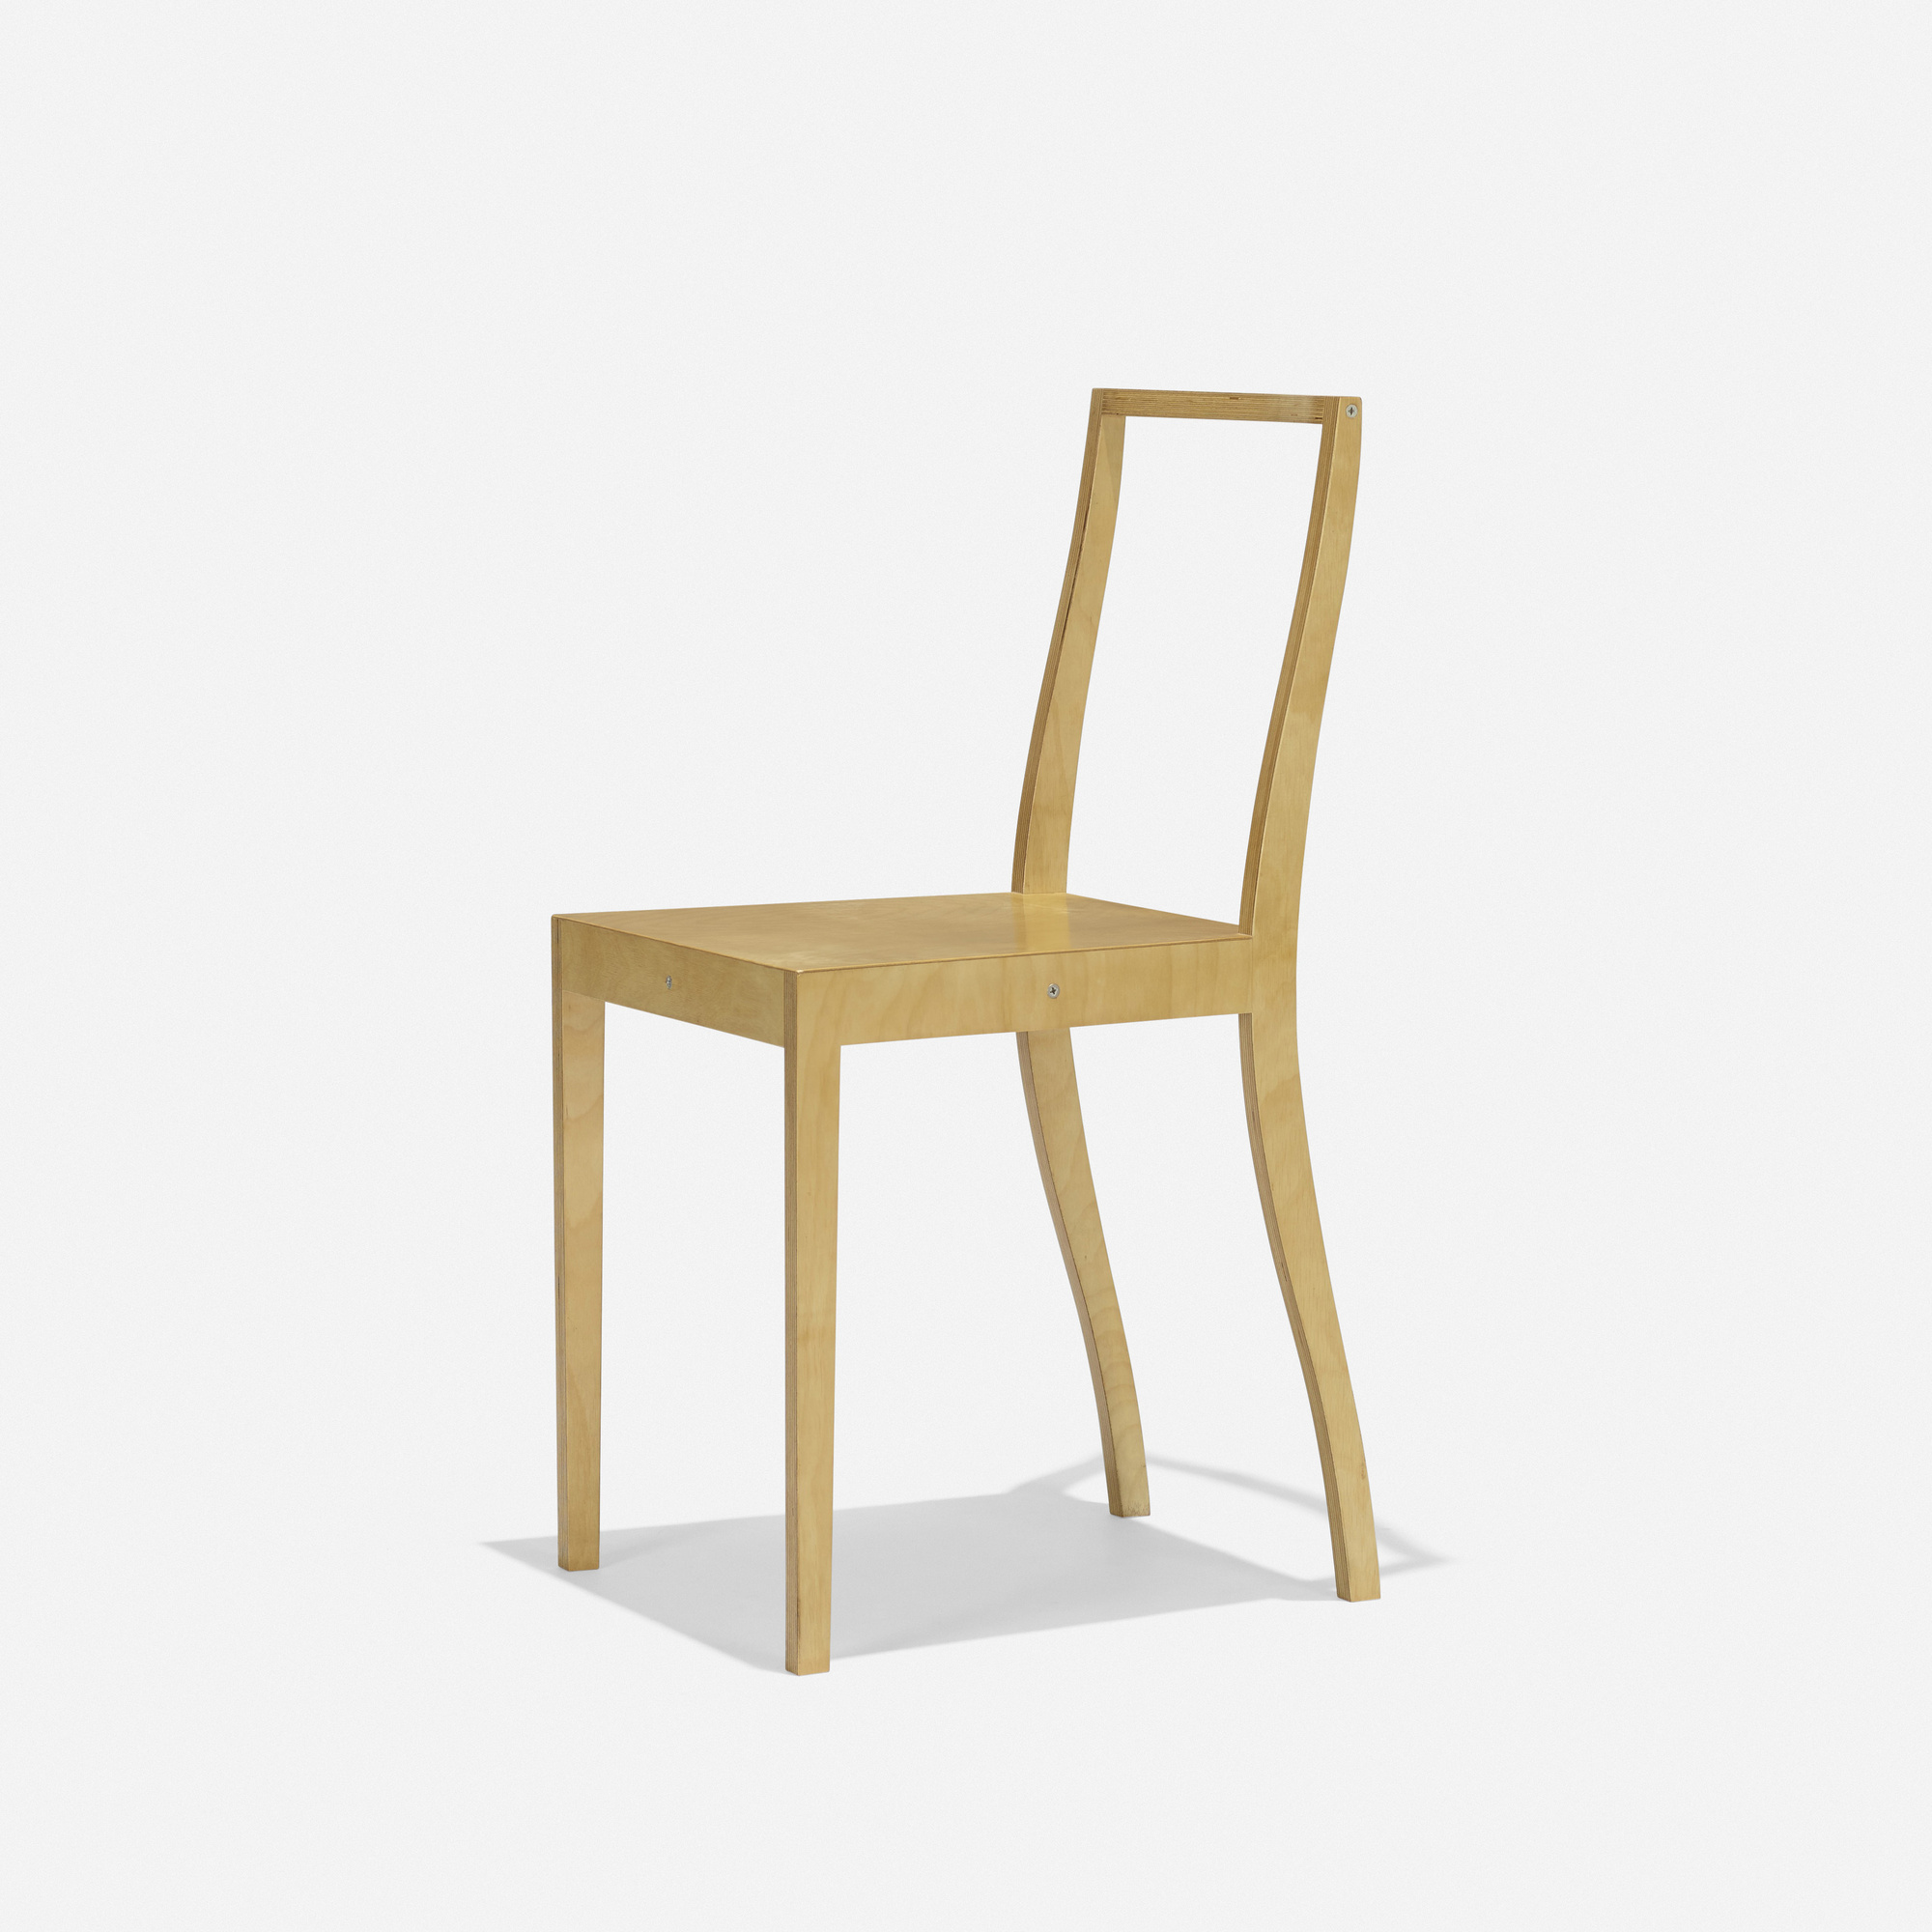 342 jasper morrison ply chair. Black Bedroom Furniture Sets. Home Design Ideas